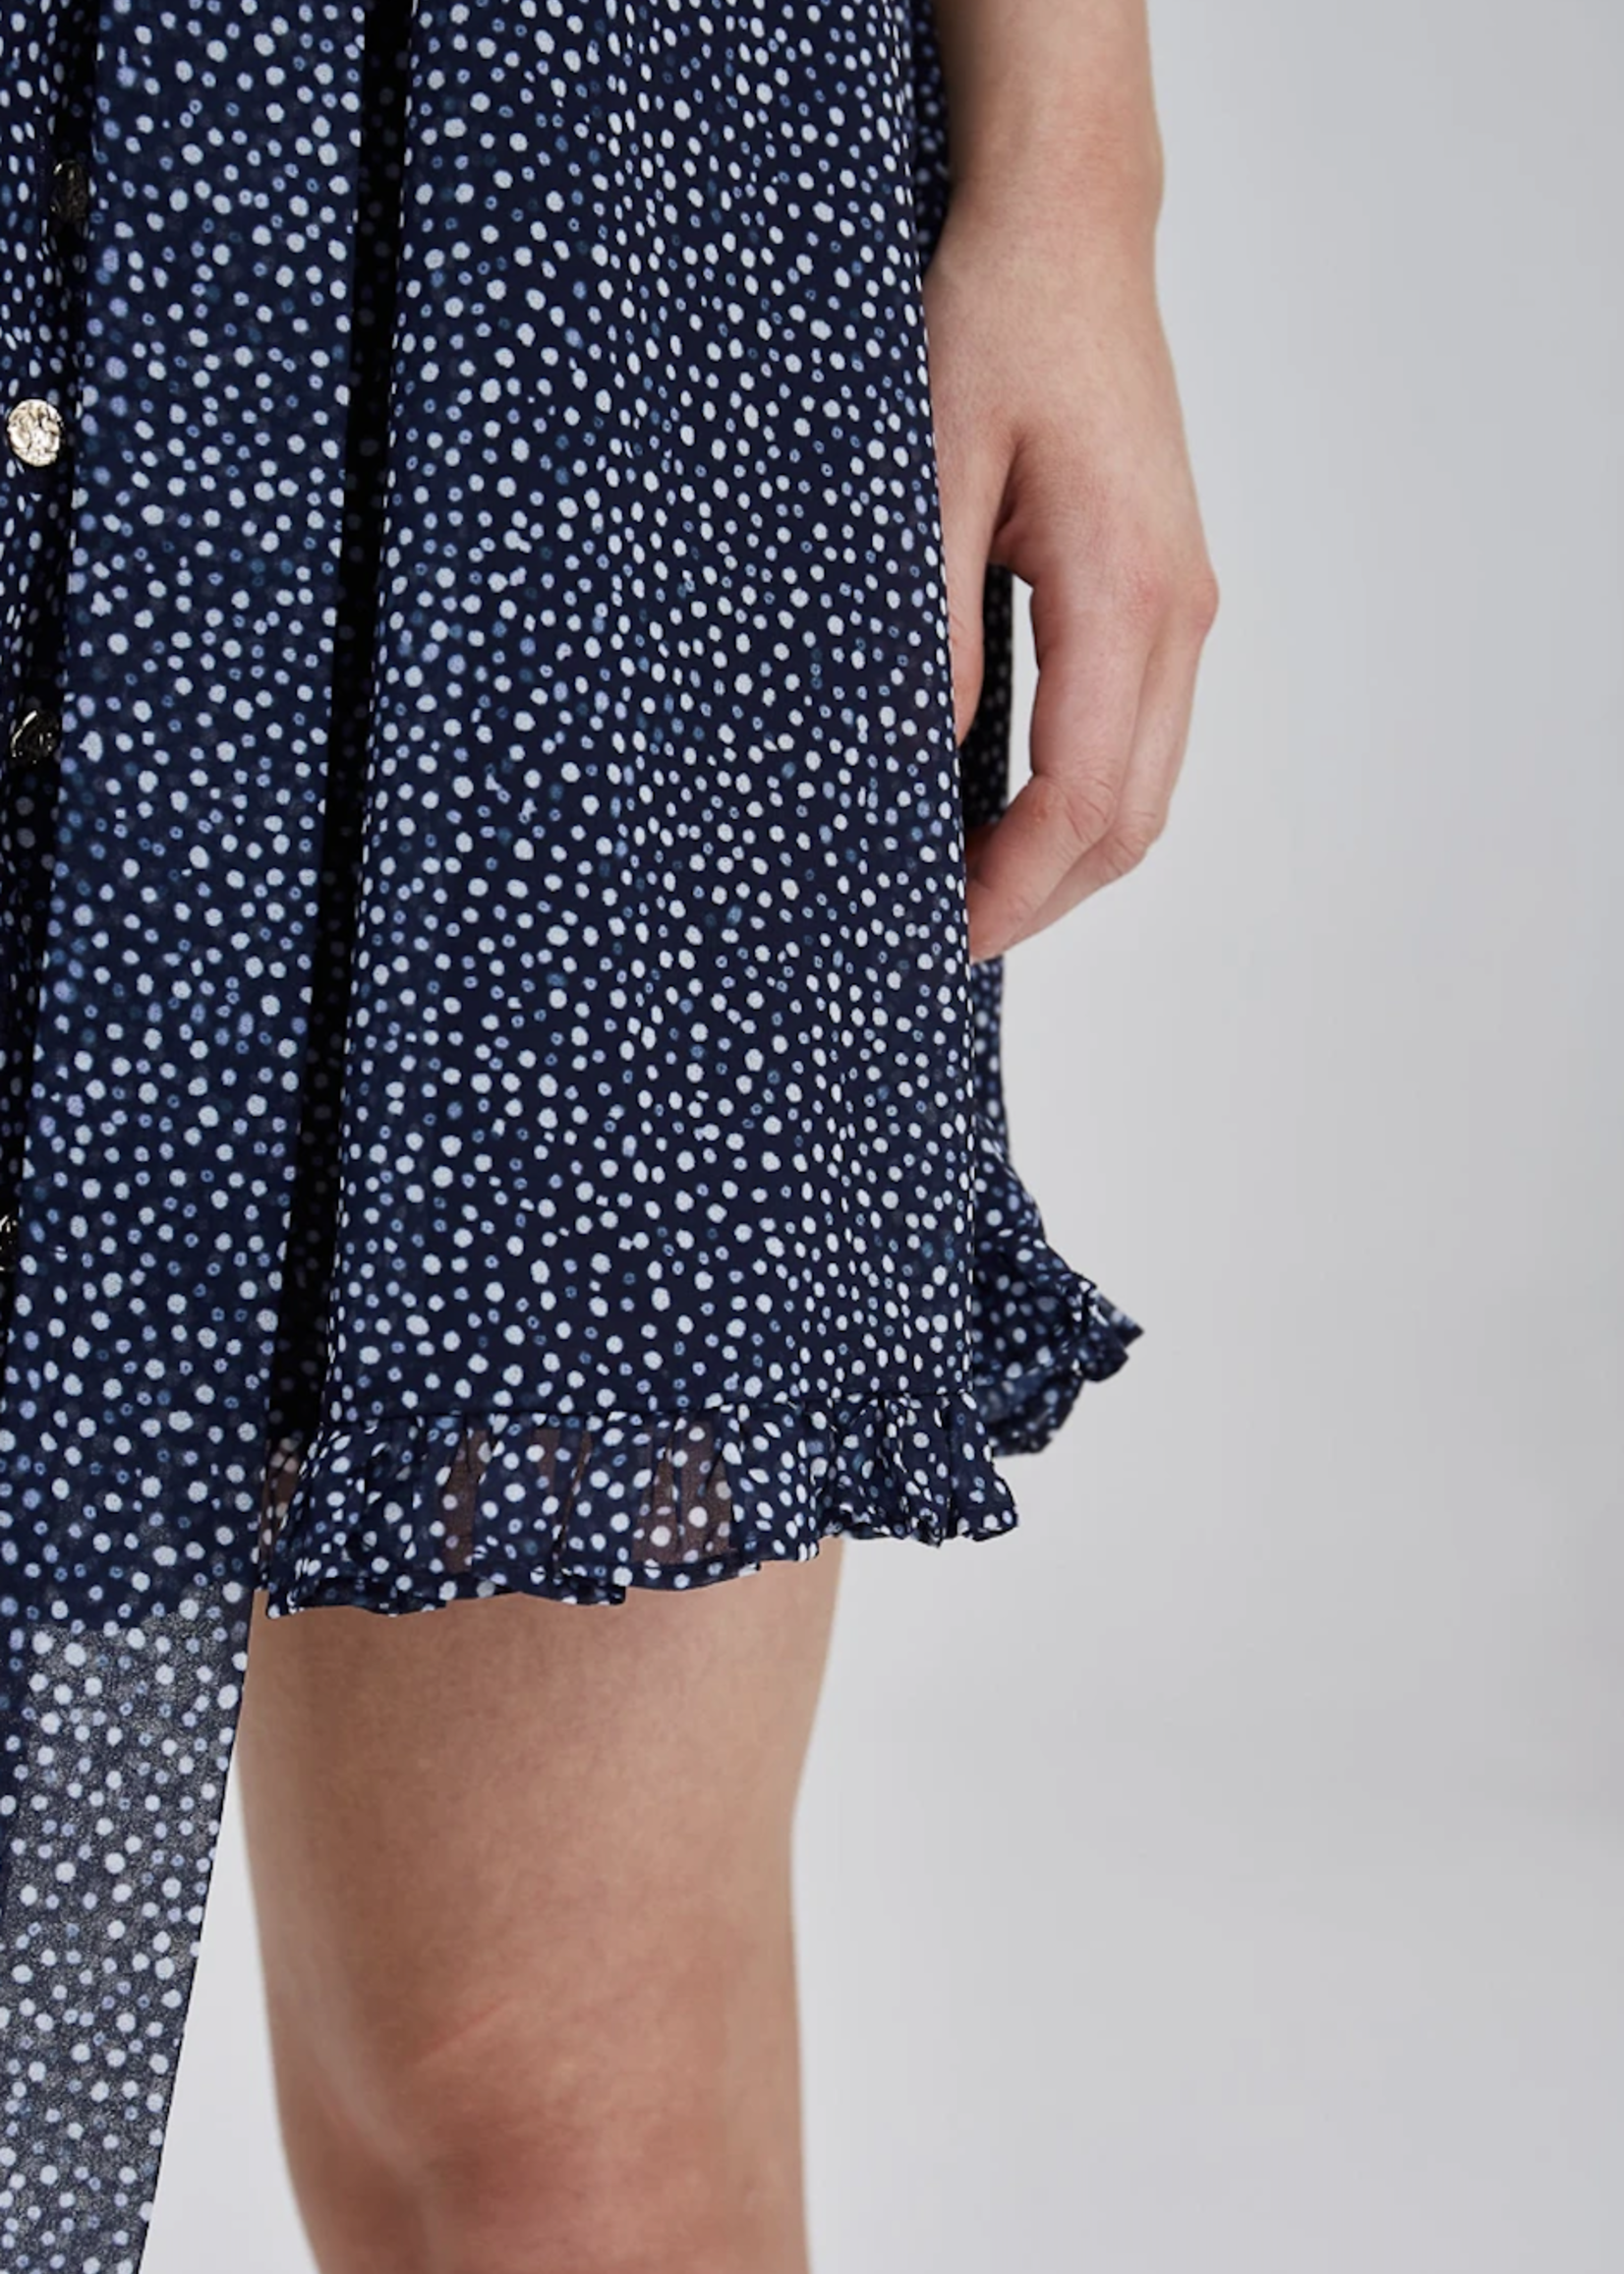 Elitaire Boutique Countless Mini Dress